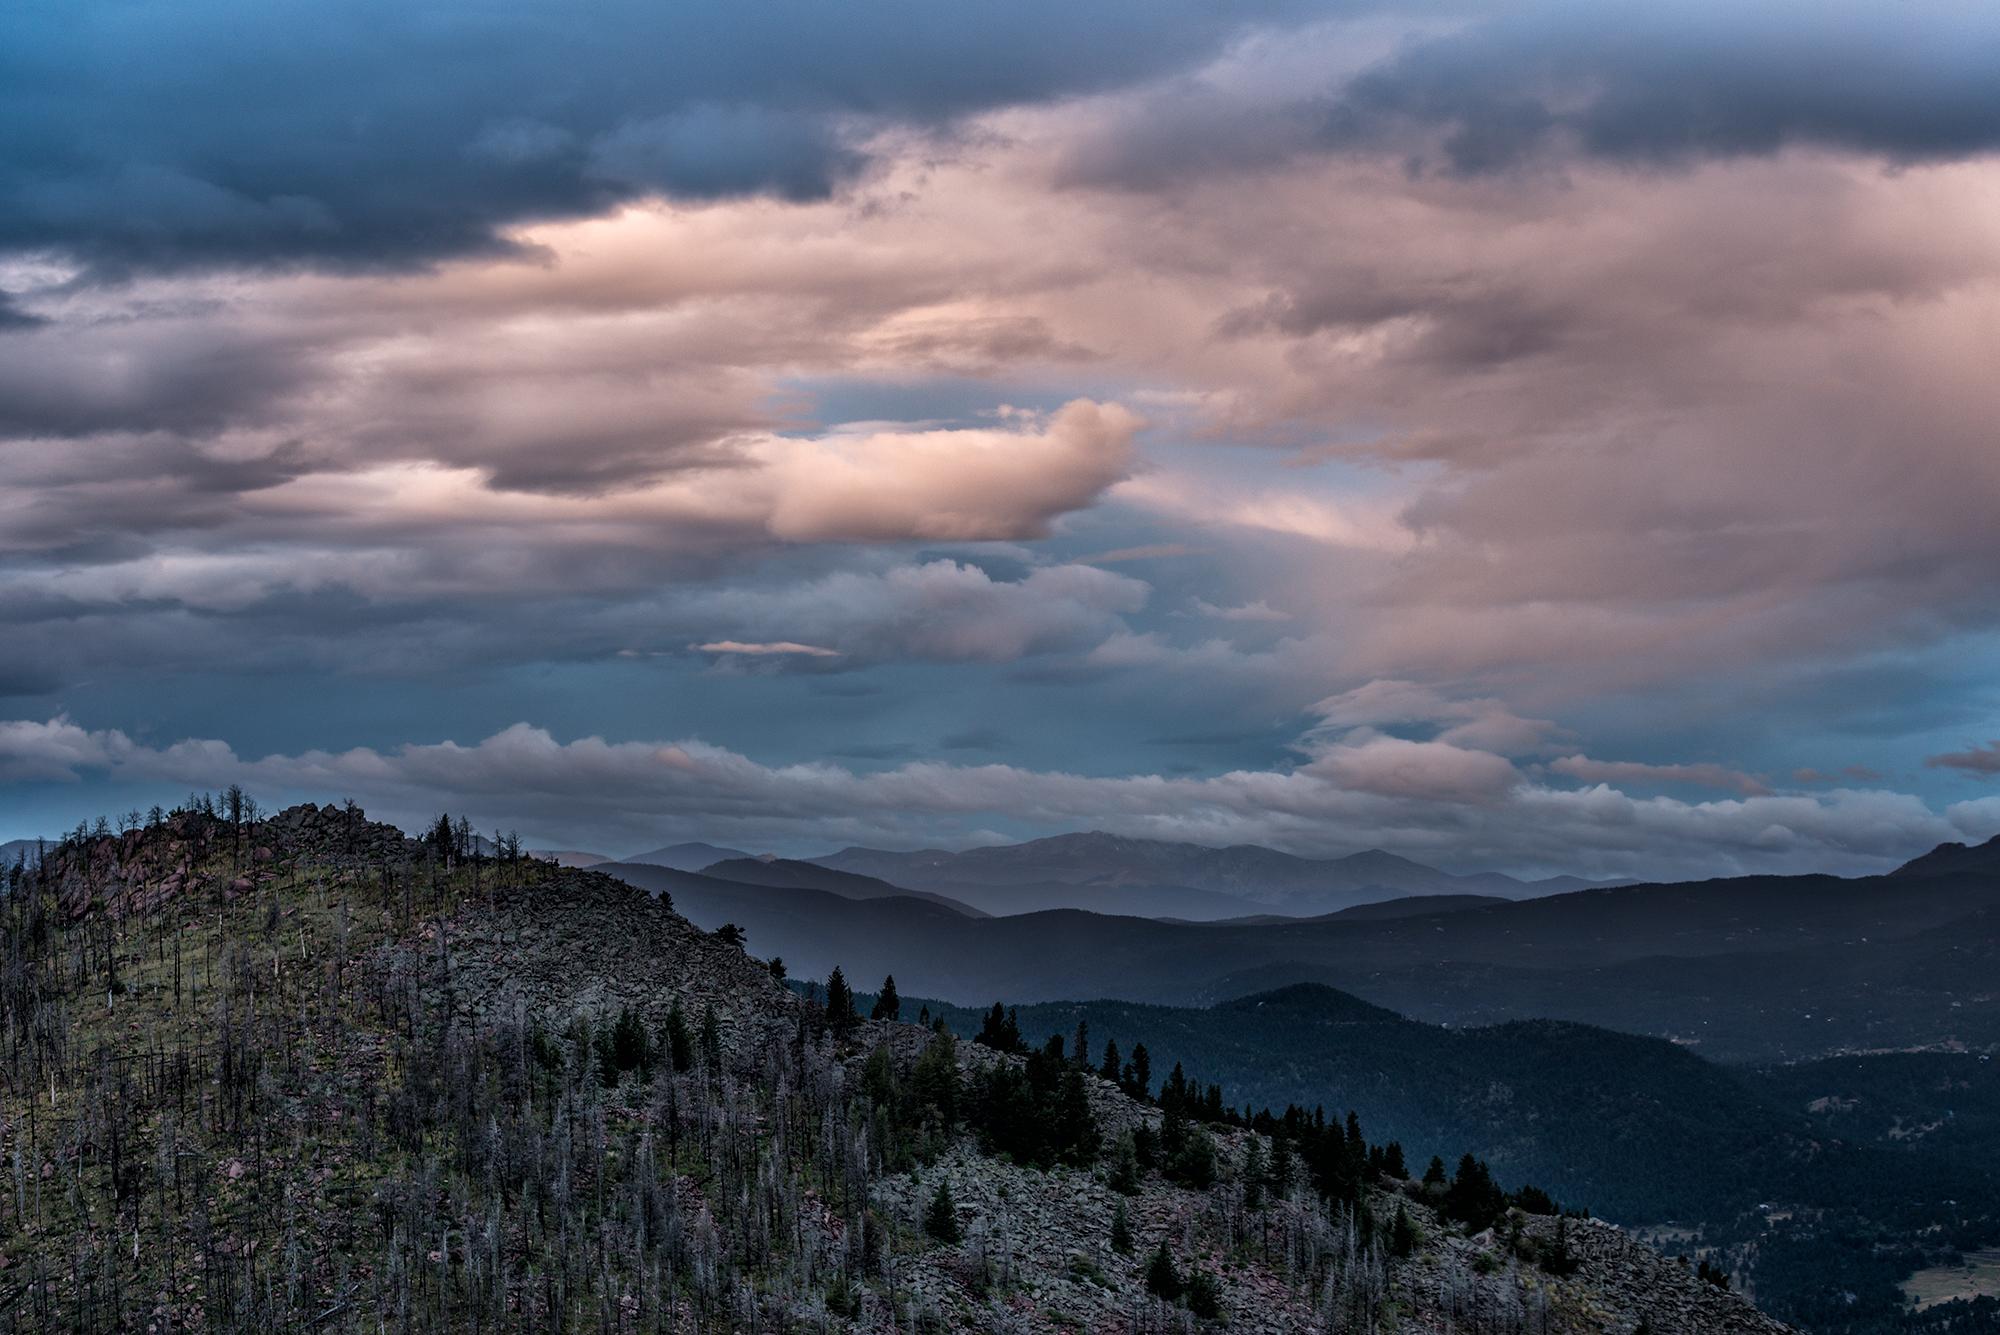 South Boulder Peak and Mt. Evans. From Bear Peak, Boulder, Colorado, 2015